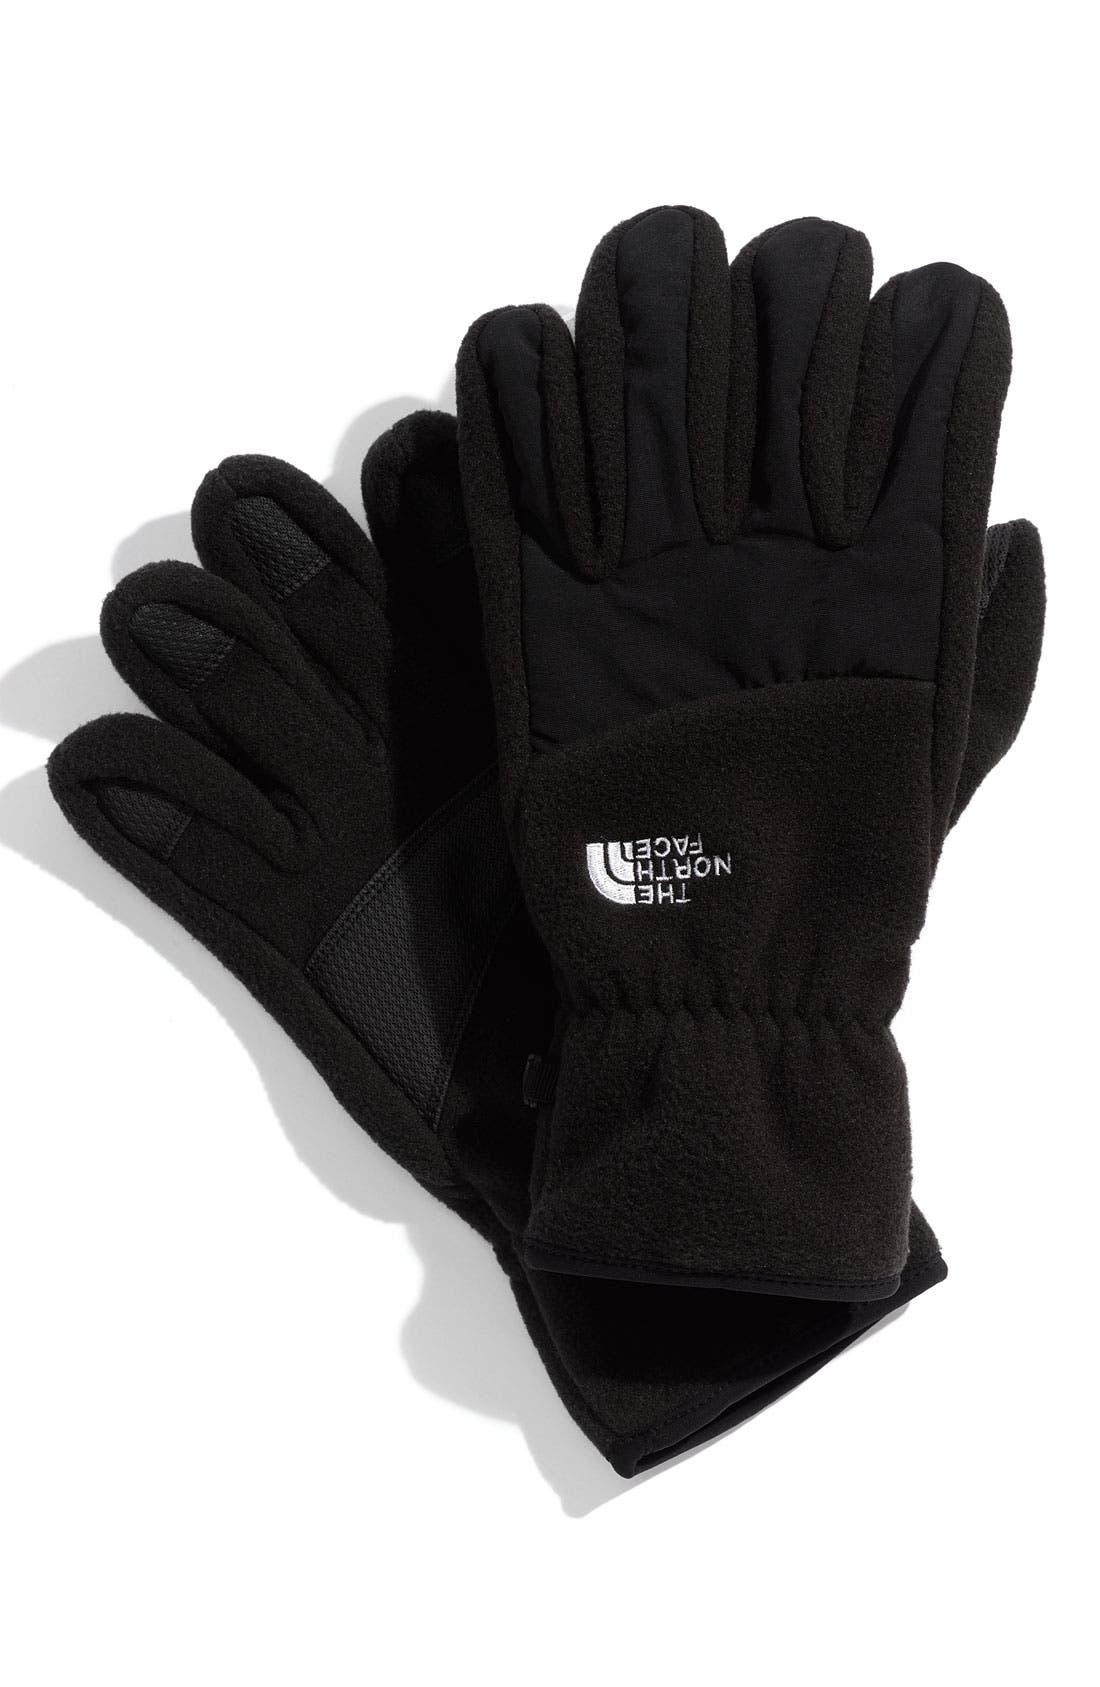 Alternate Image 1 Selected - The North Face 'Denali' Fleece Gloves (Men)